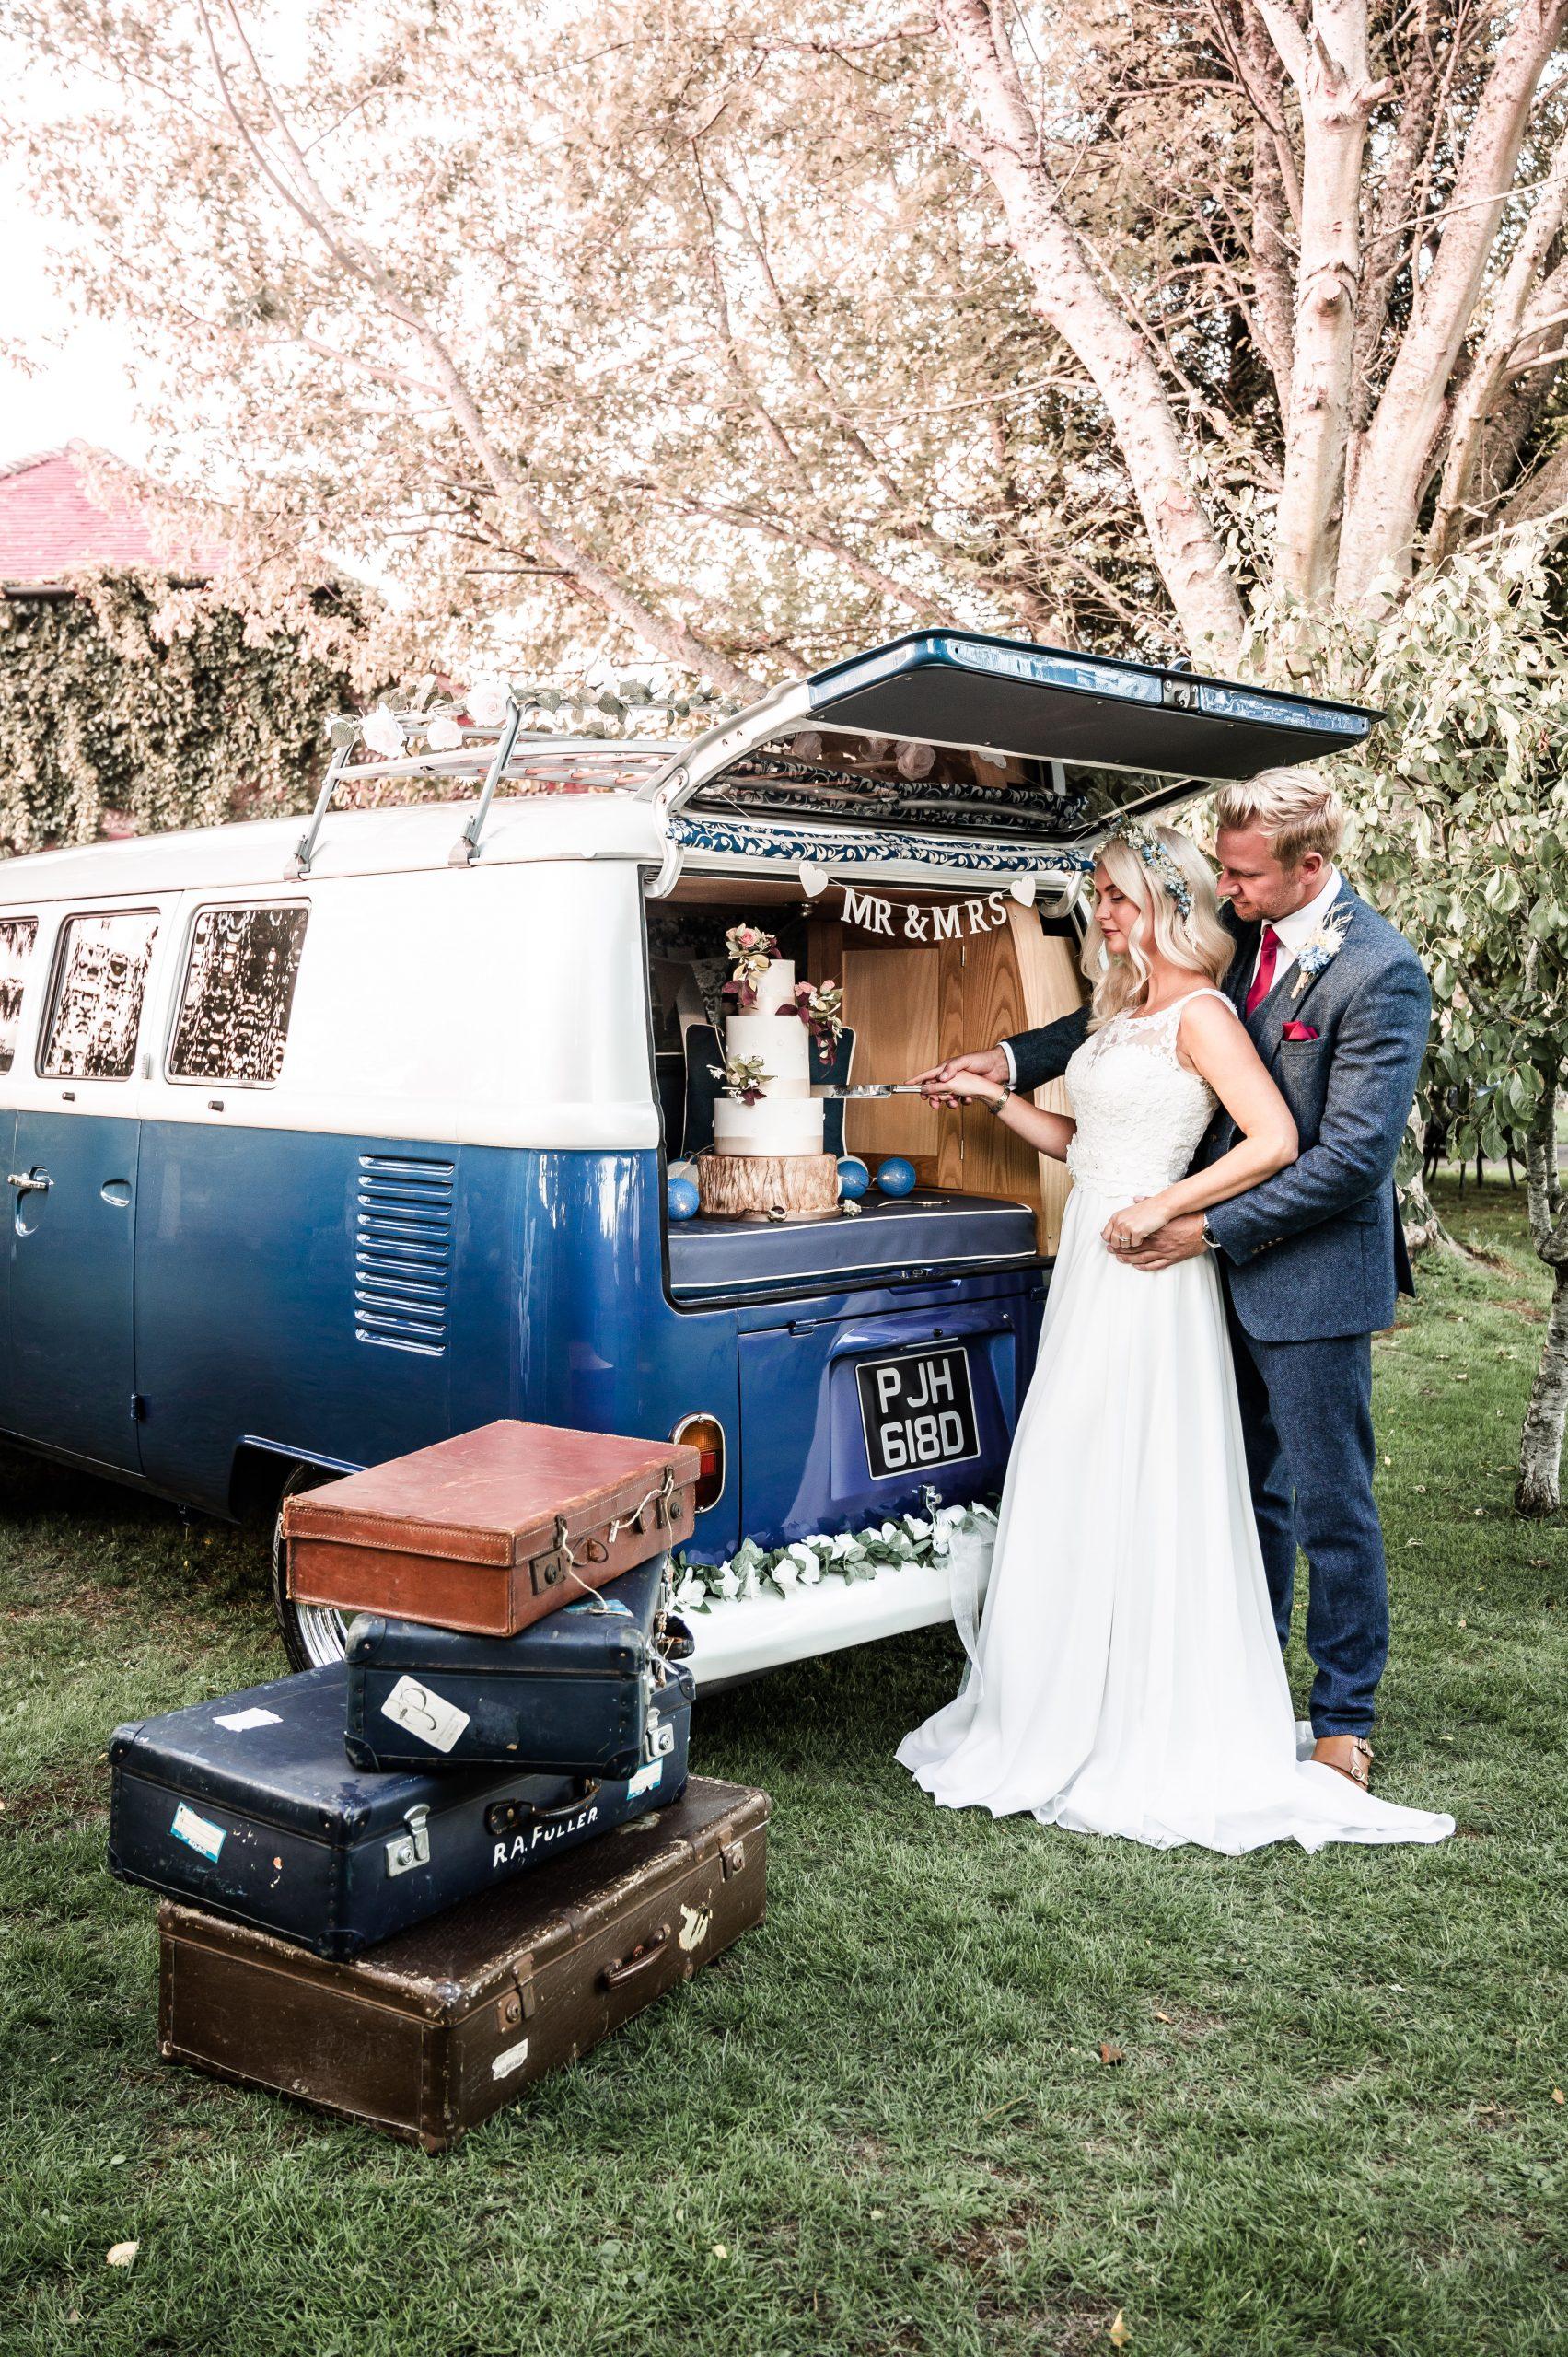 Something Blue Wedding Car Hire https://www.somethingbluecarhire.com